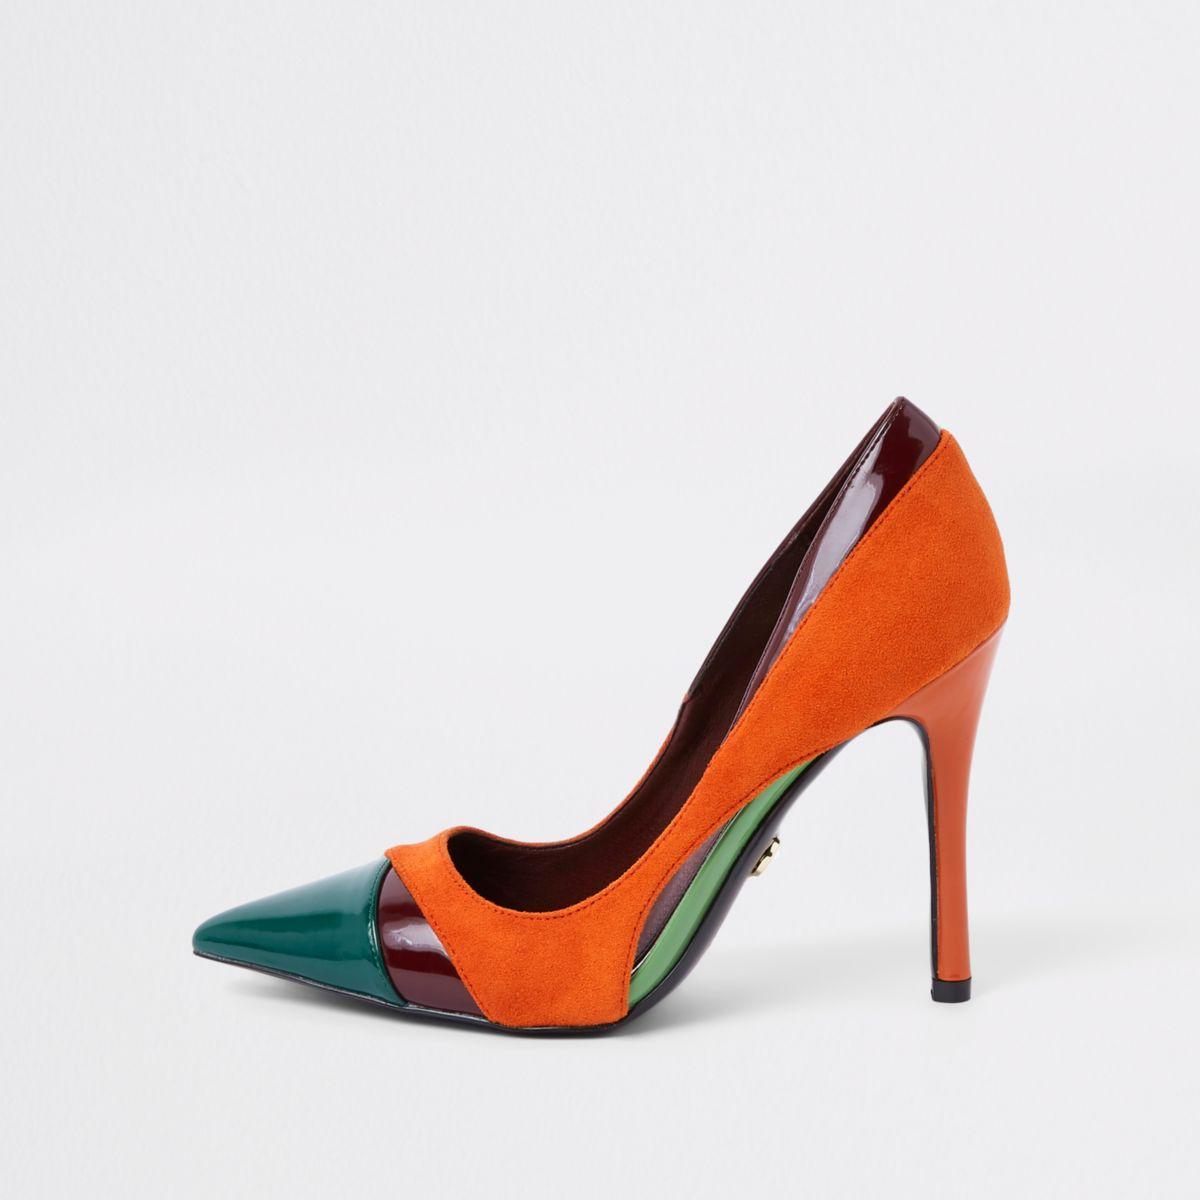 Orange color block pumps